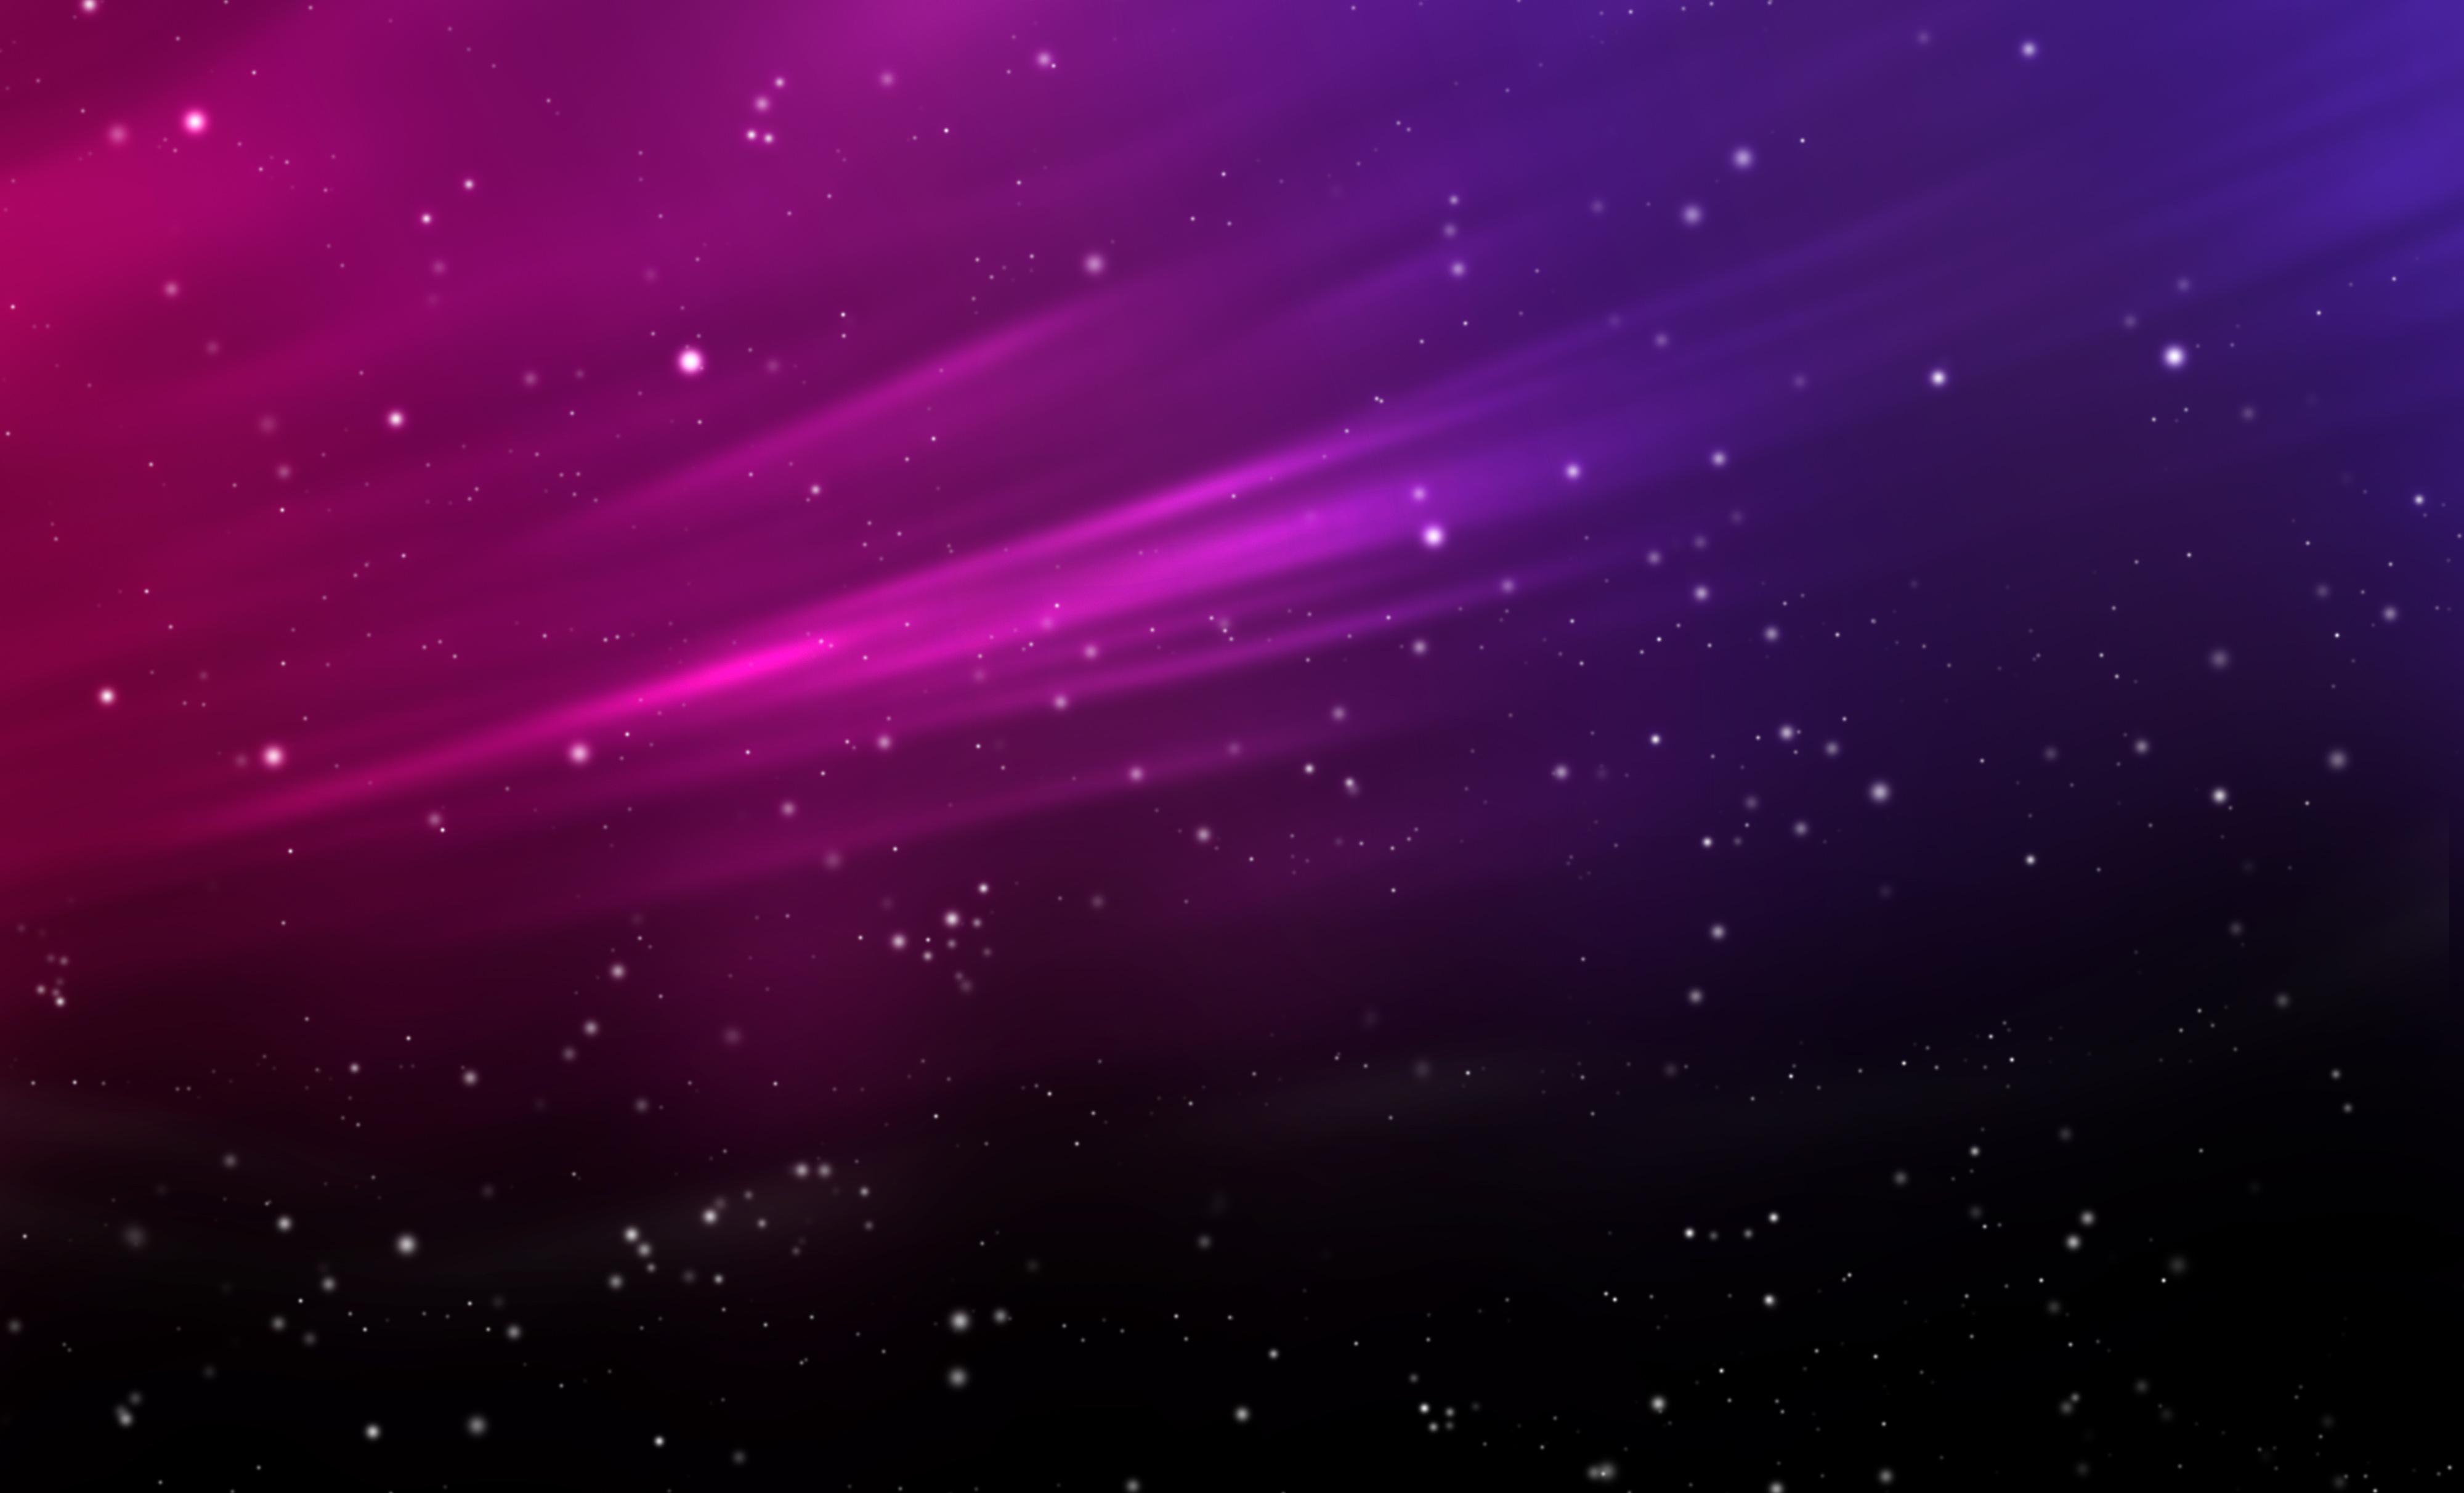 Purple Wallpaper Backgrounds Wallpapersafari